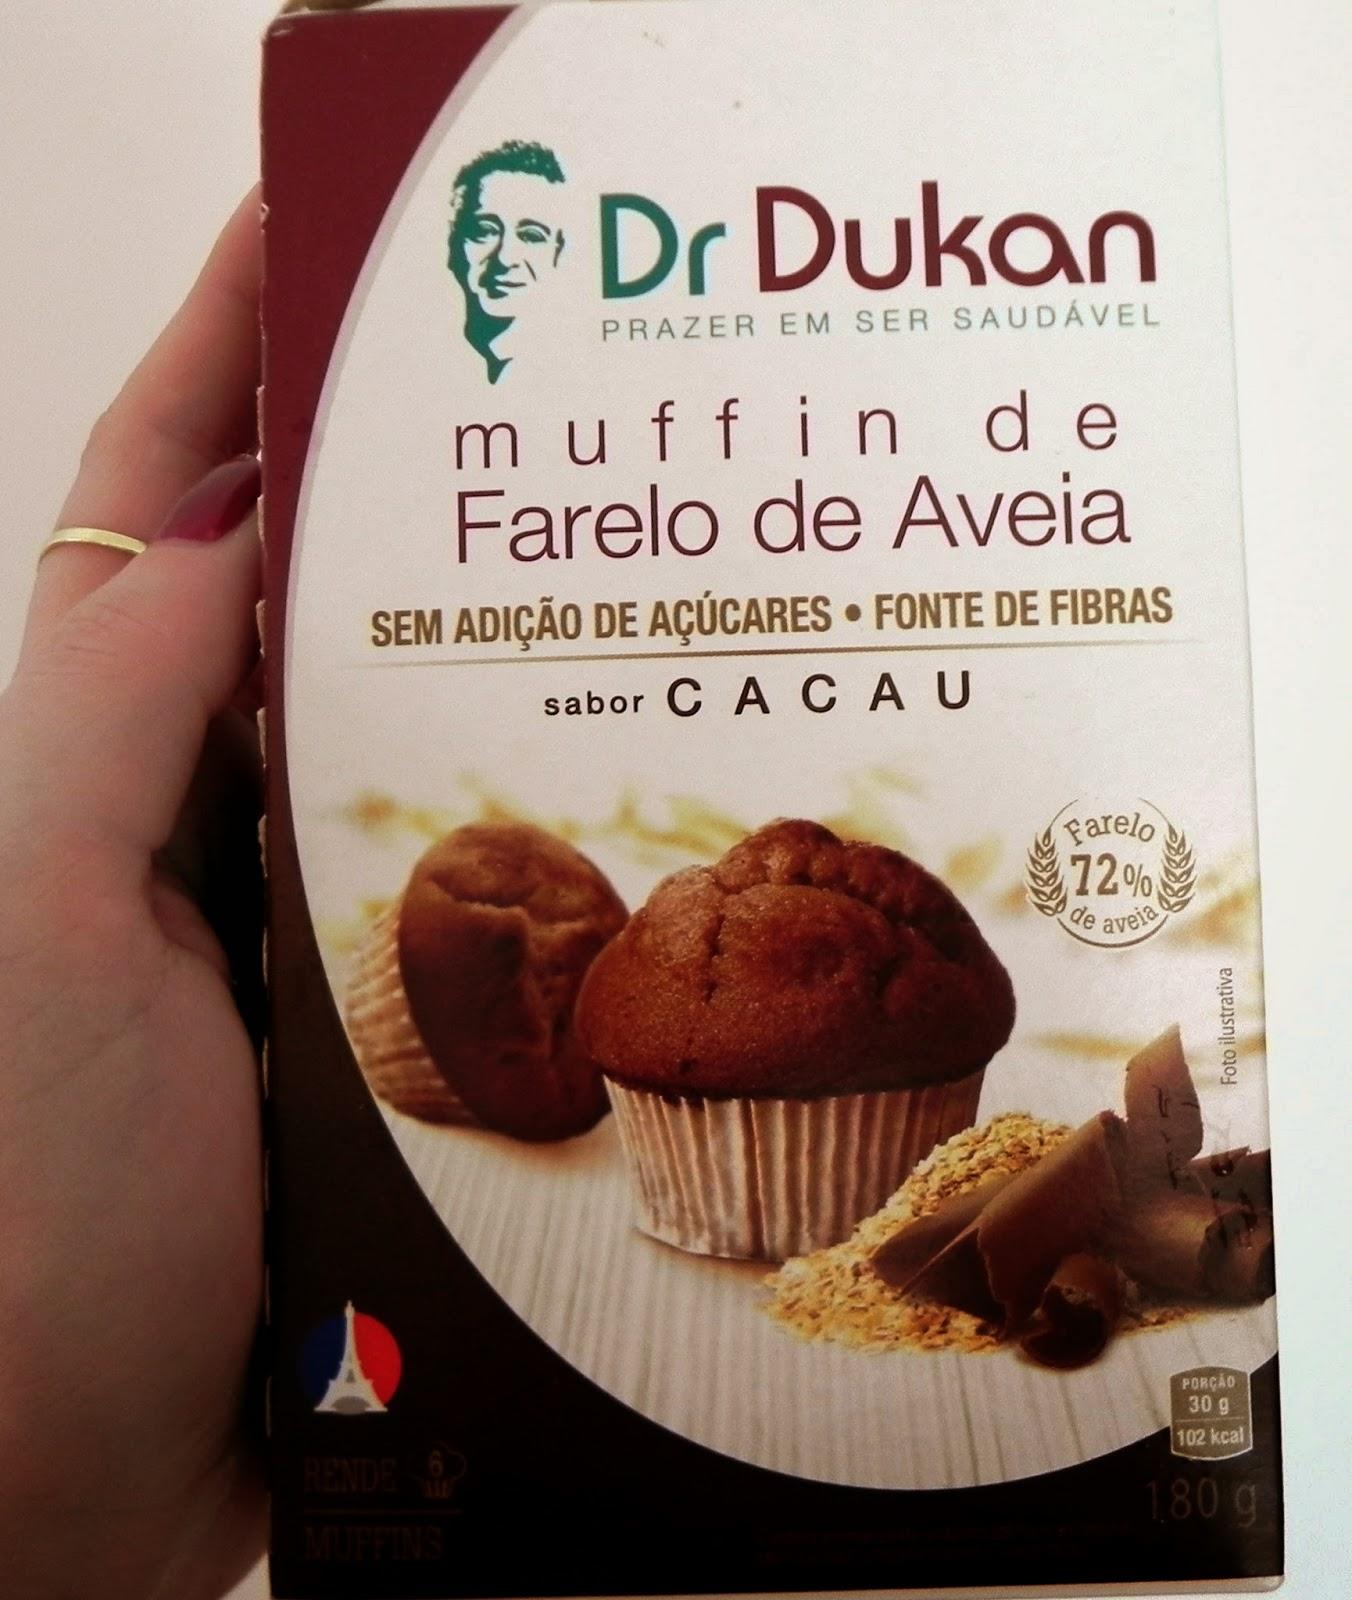 muffin de aveia